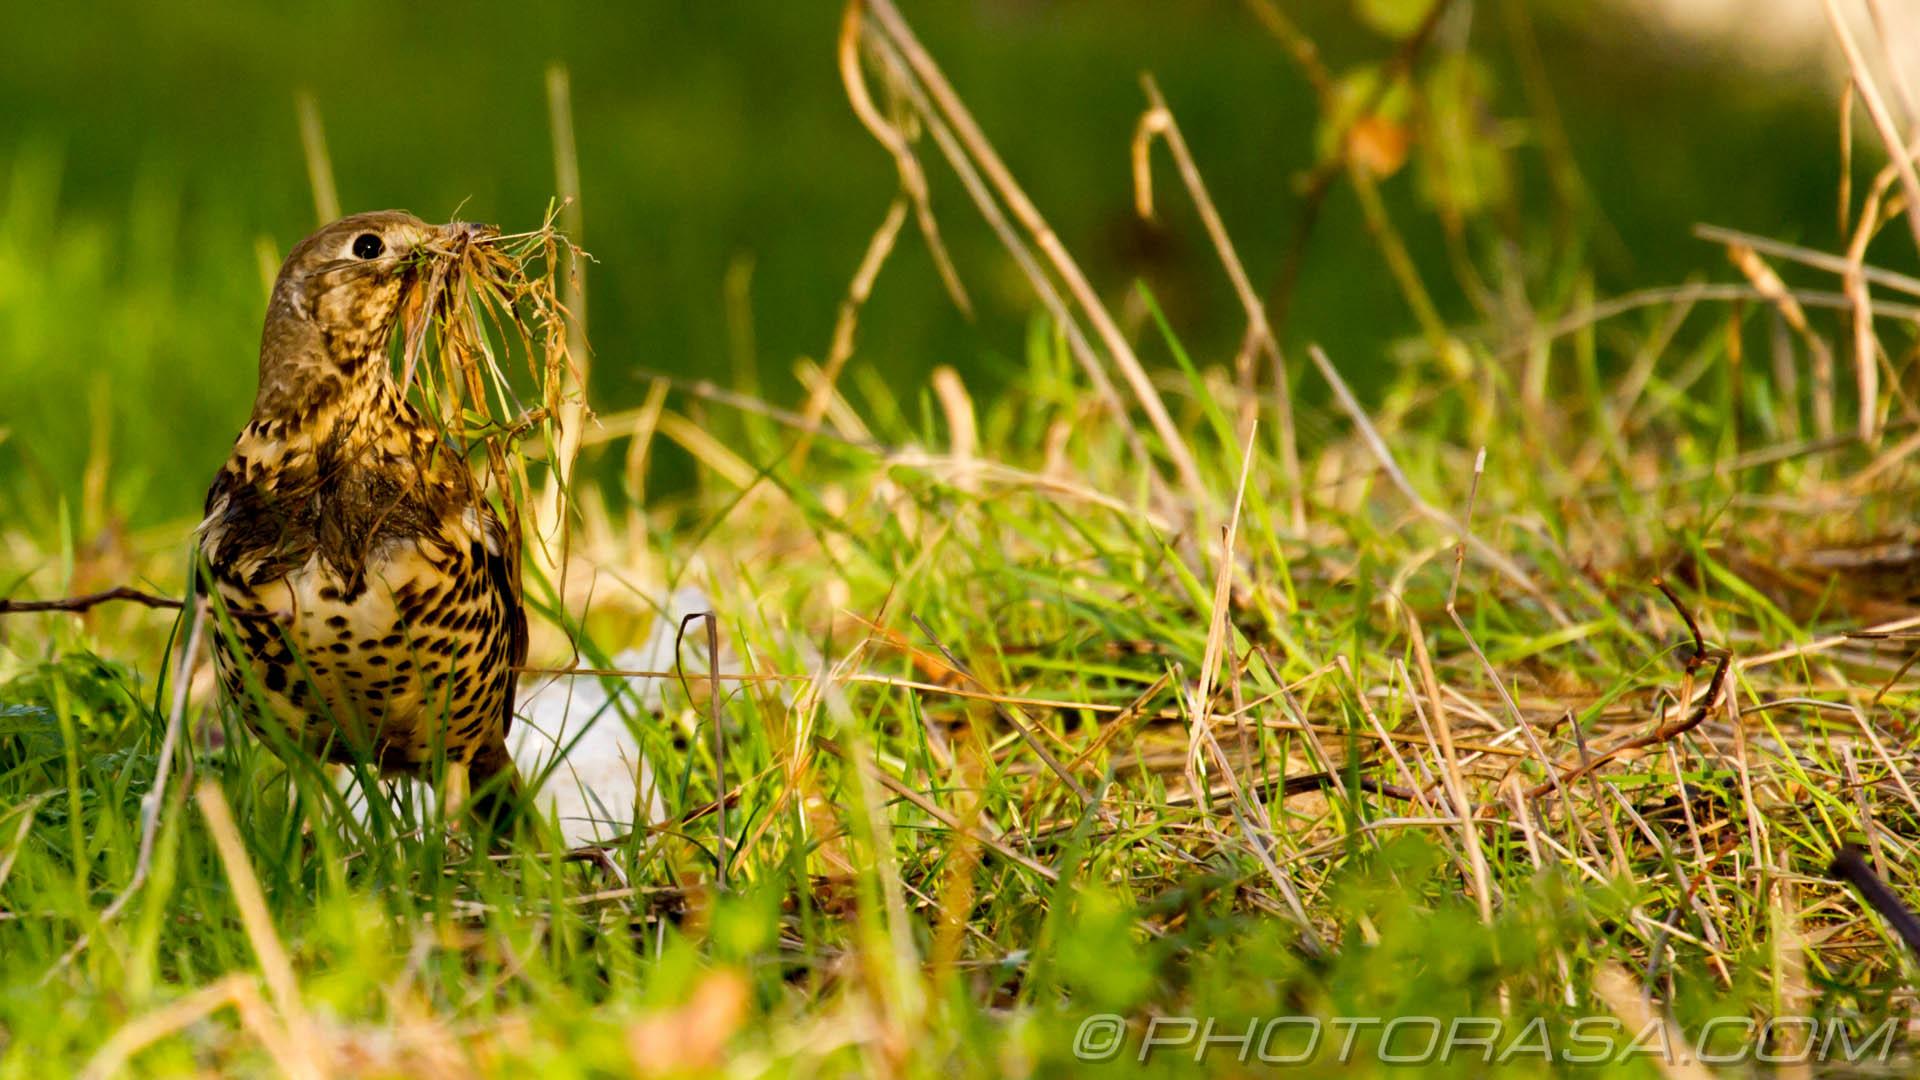 http://photorasa.com/mistle-thrush-scavenging-nest-materials/mistle-thrush-in-long-grass-collect-nest-materials/